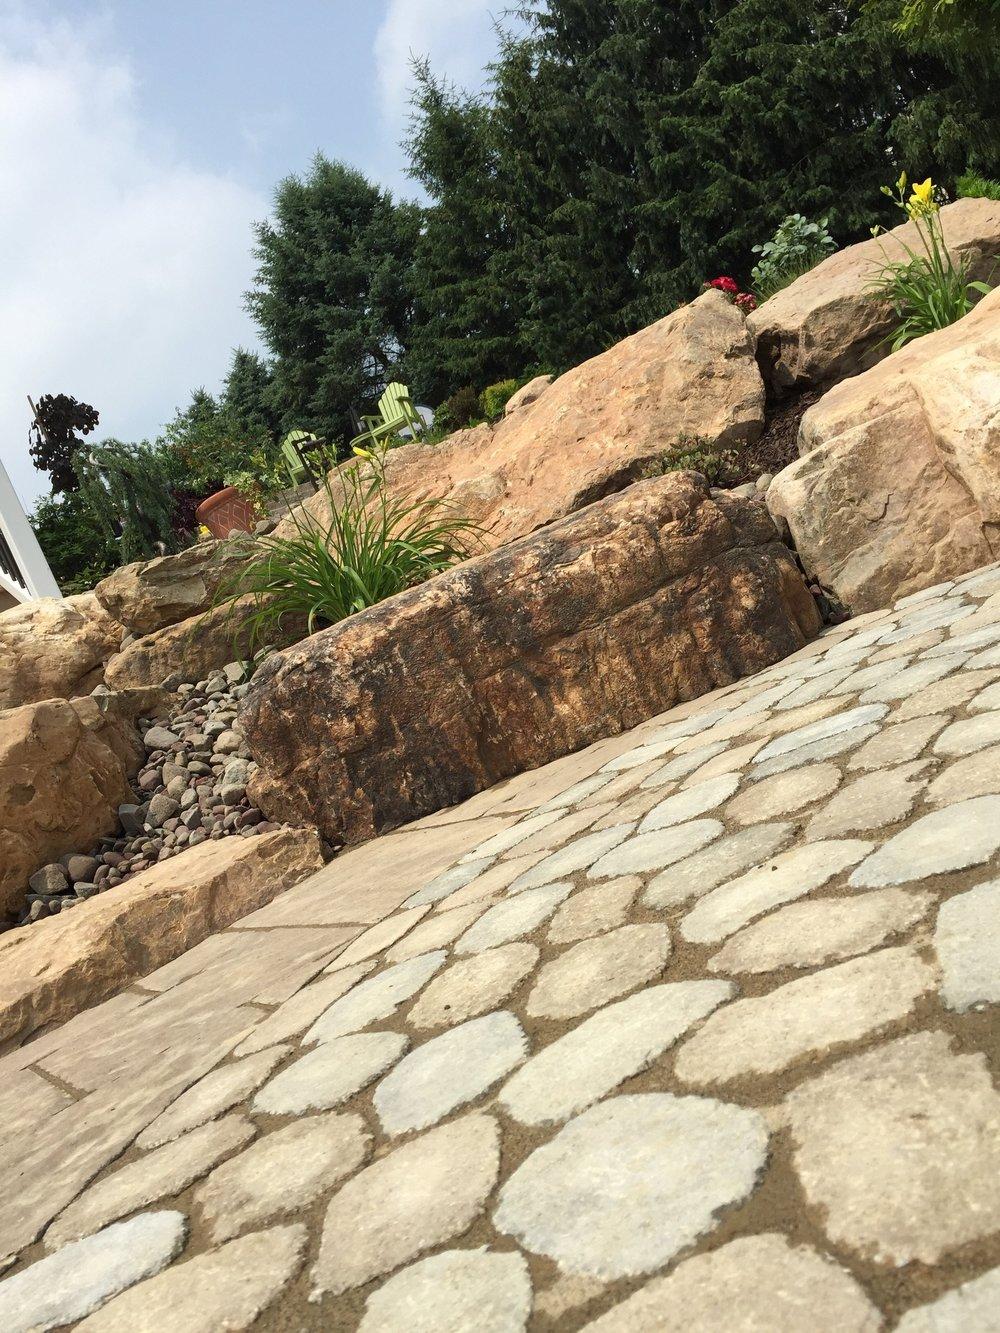 Landscaping pavers landscape design in Allentown, PA